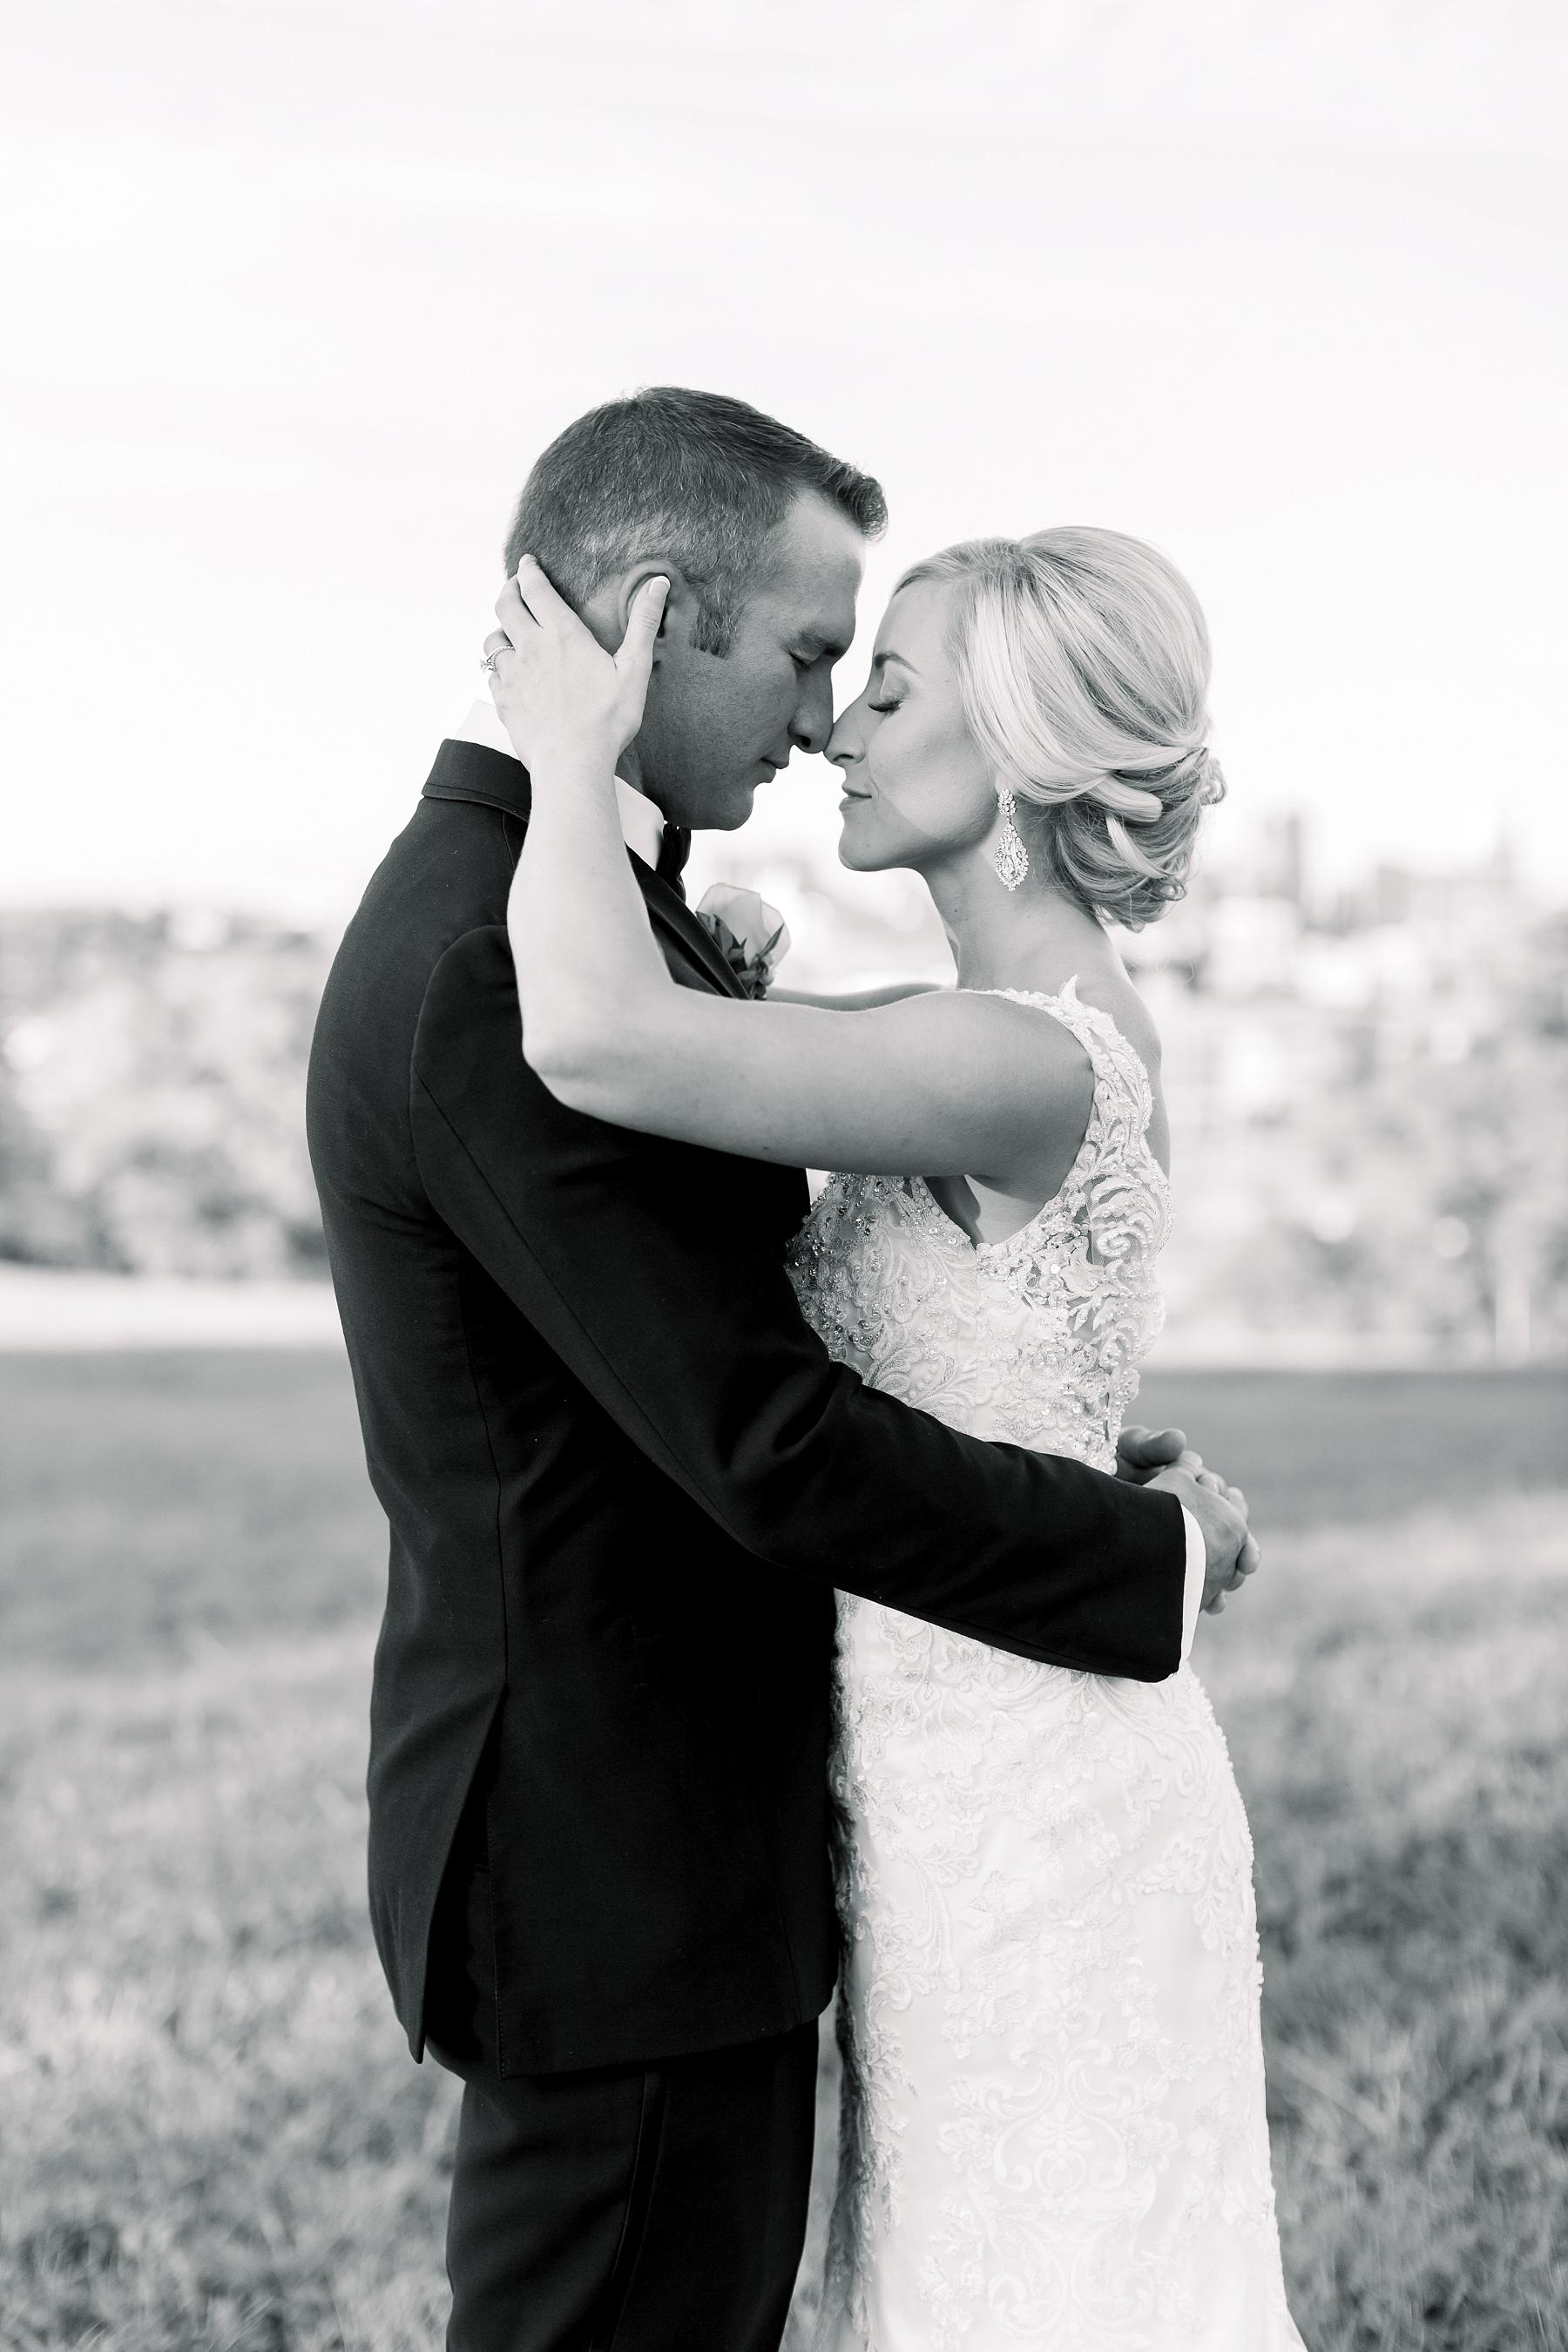 midwest-adventurous-wedding-photographer-elizabeth-ladean-photography-photo_4803.jpg